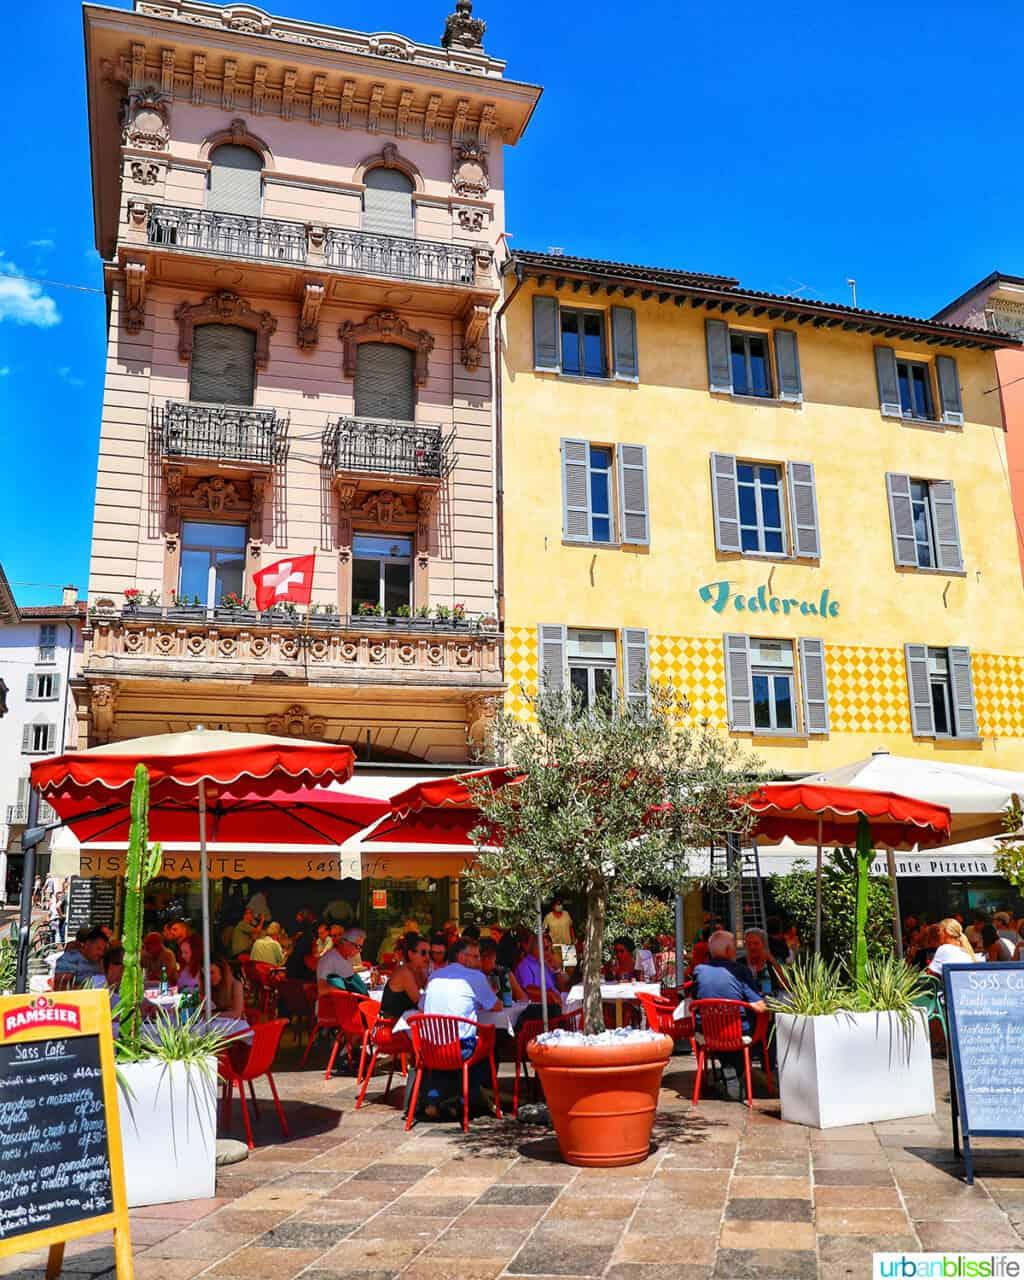 colorful restaurants in Lugano, Switzerland